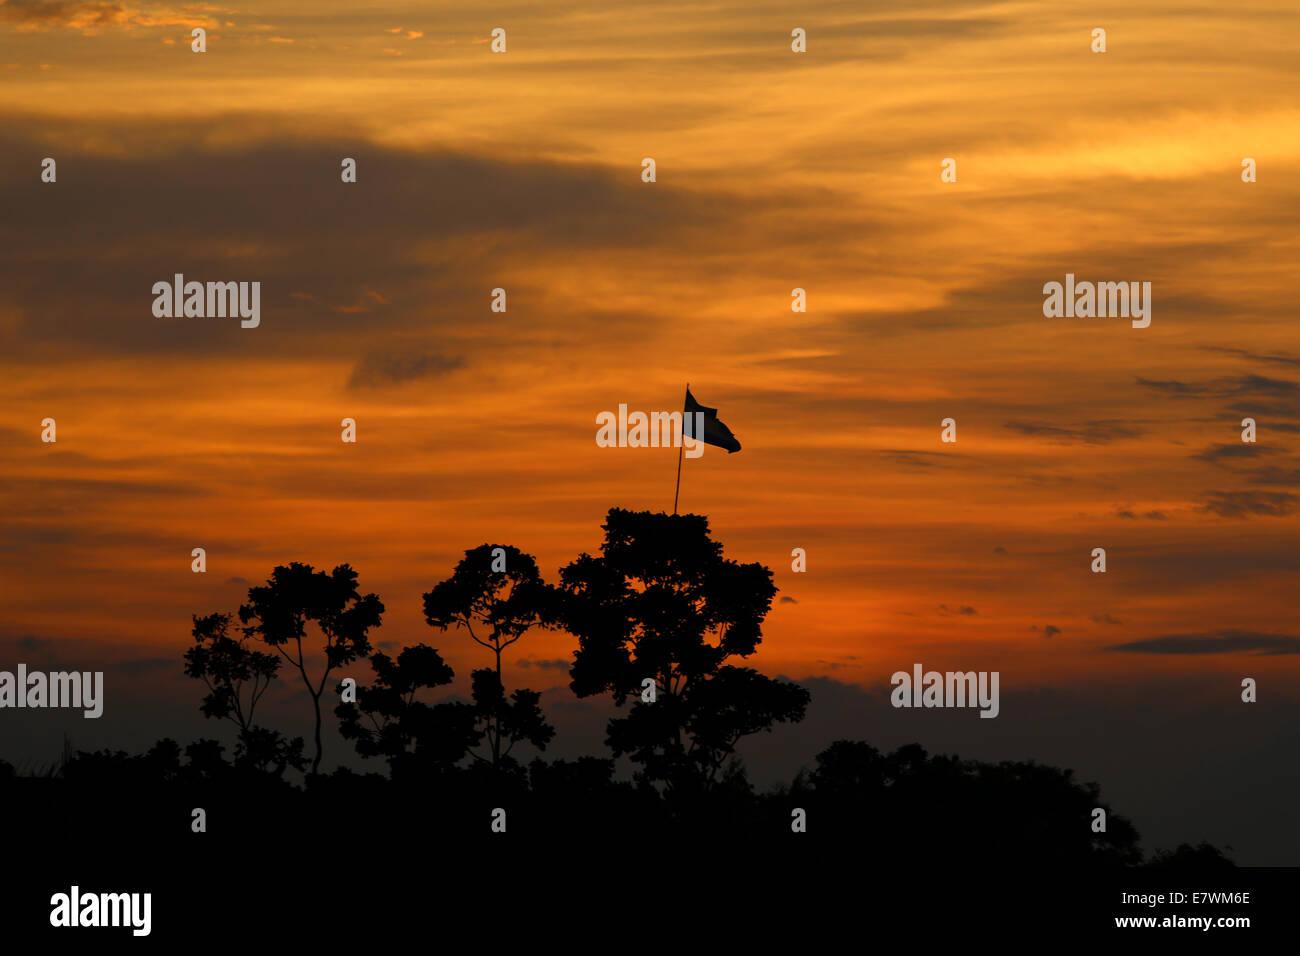 Golden moment after setting sun near Dhaka in Bangladesh - Stock Image